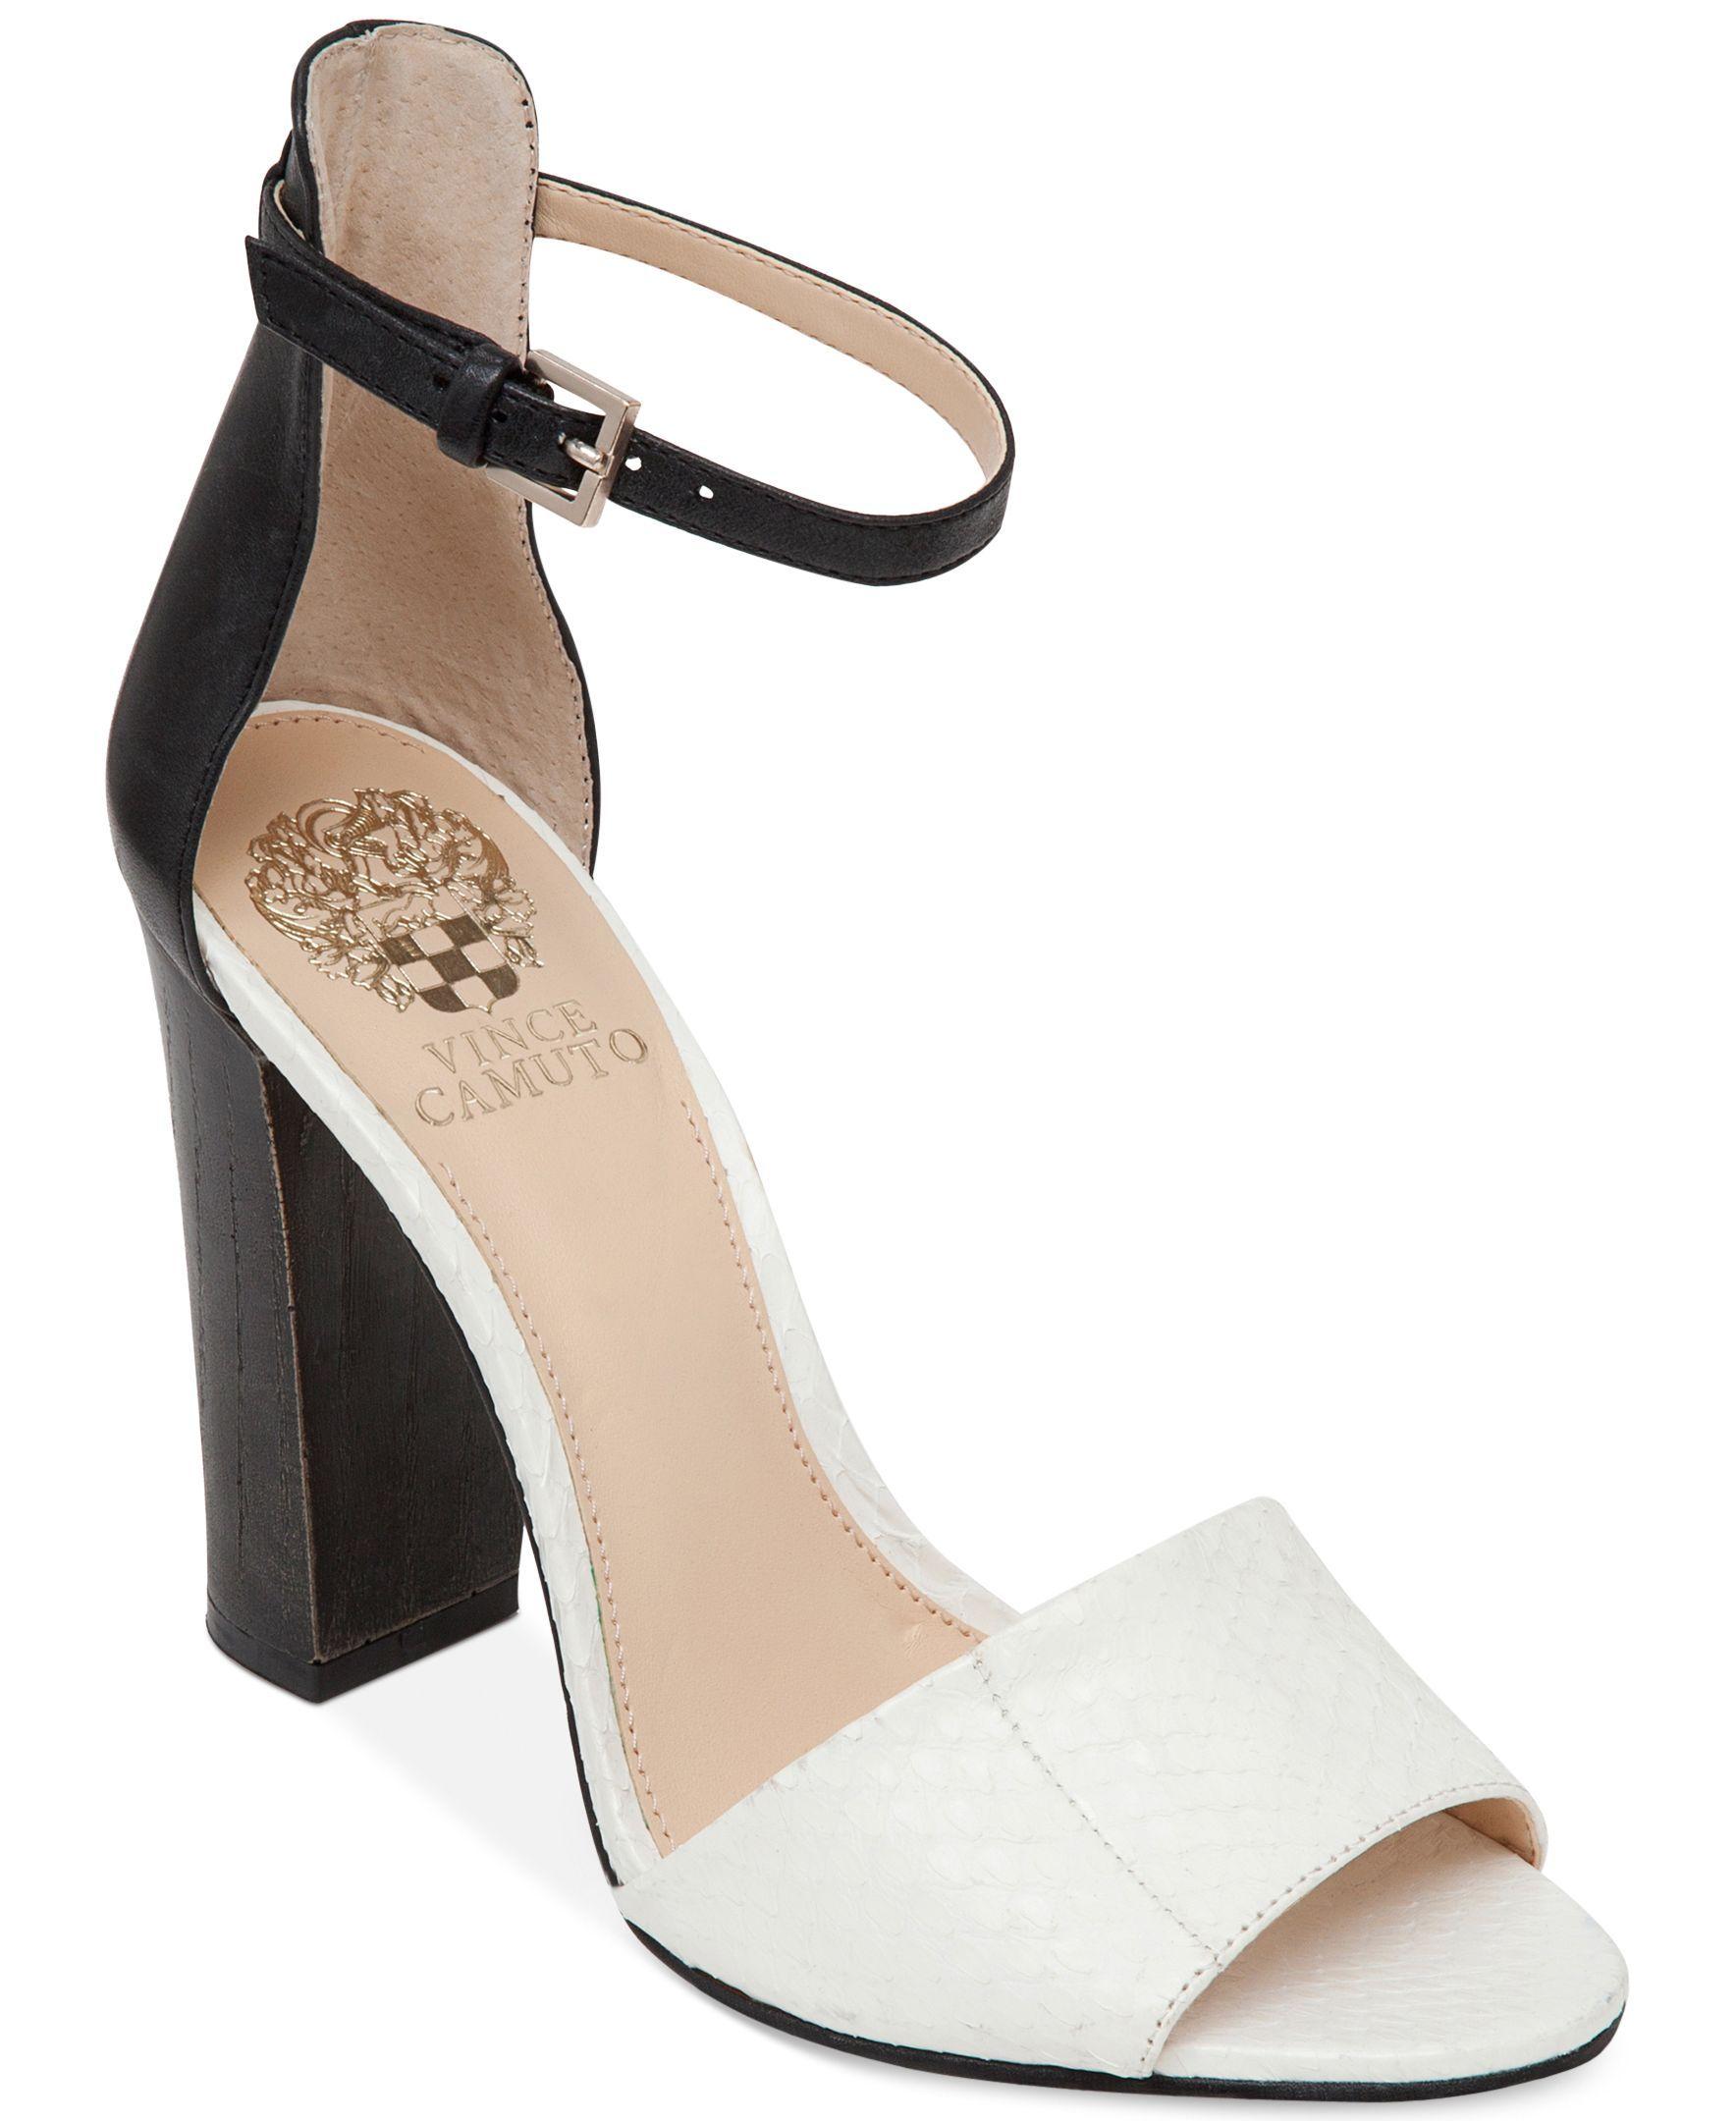 dc8ba0dc6a Vince Camuto Velenza Block Heel Ankle Strap Dress Sandals | More ...